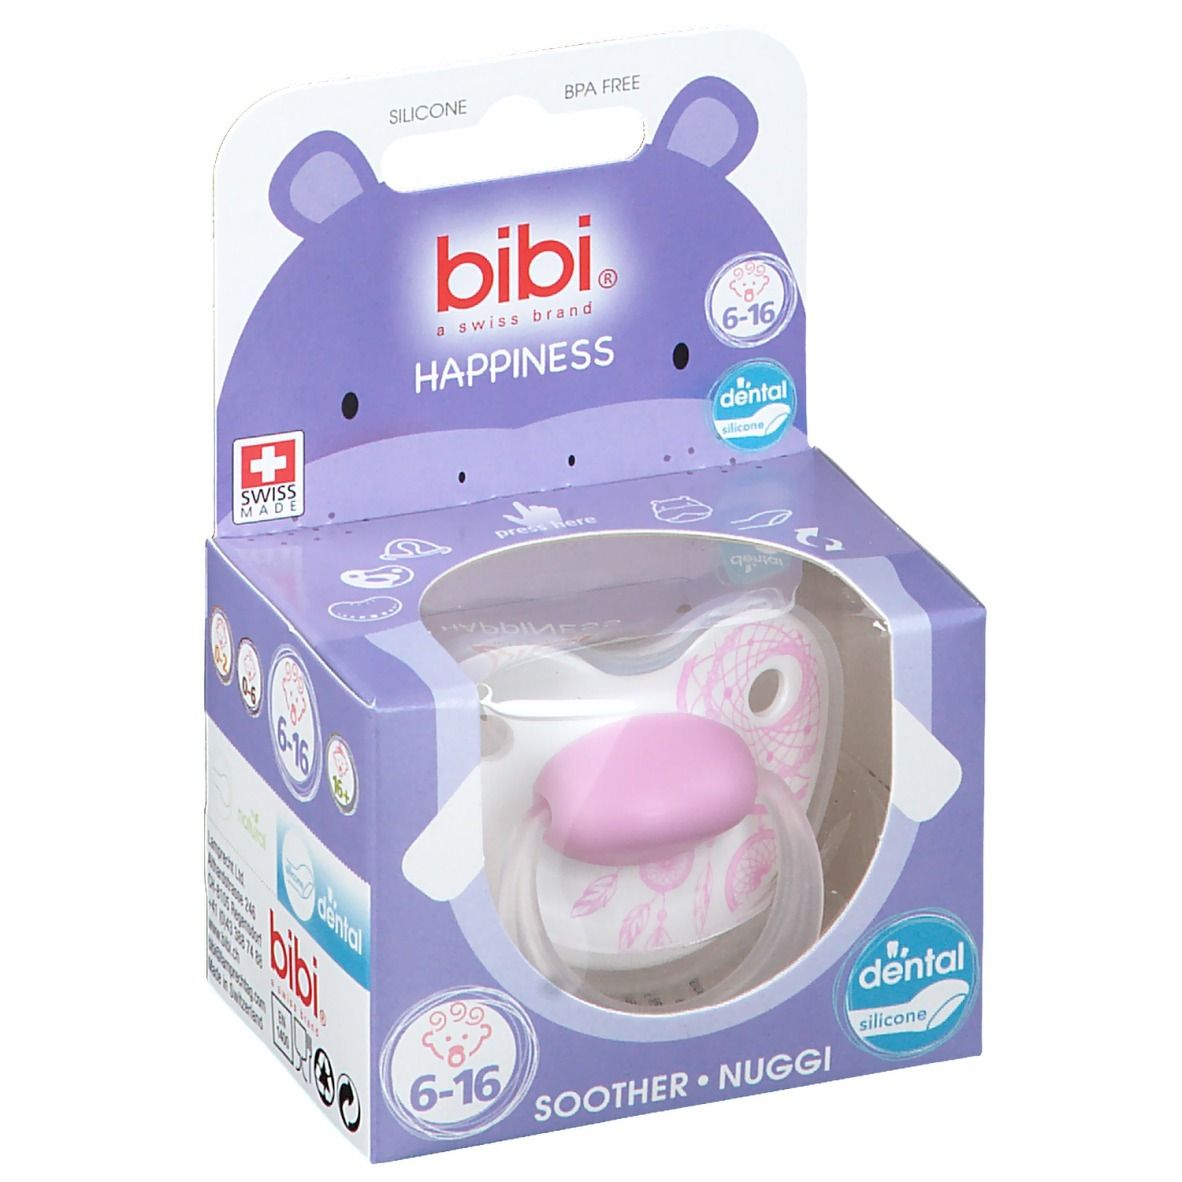 bibi® Happiness Sucette Dental Dreamcatcher 6-16 mois